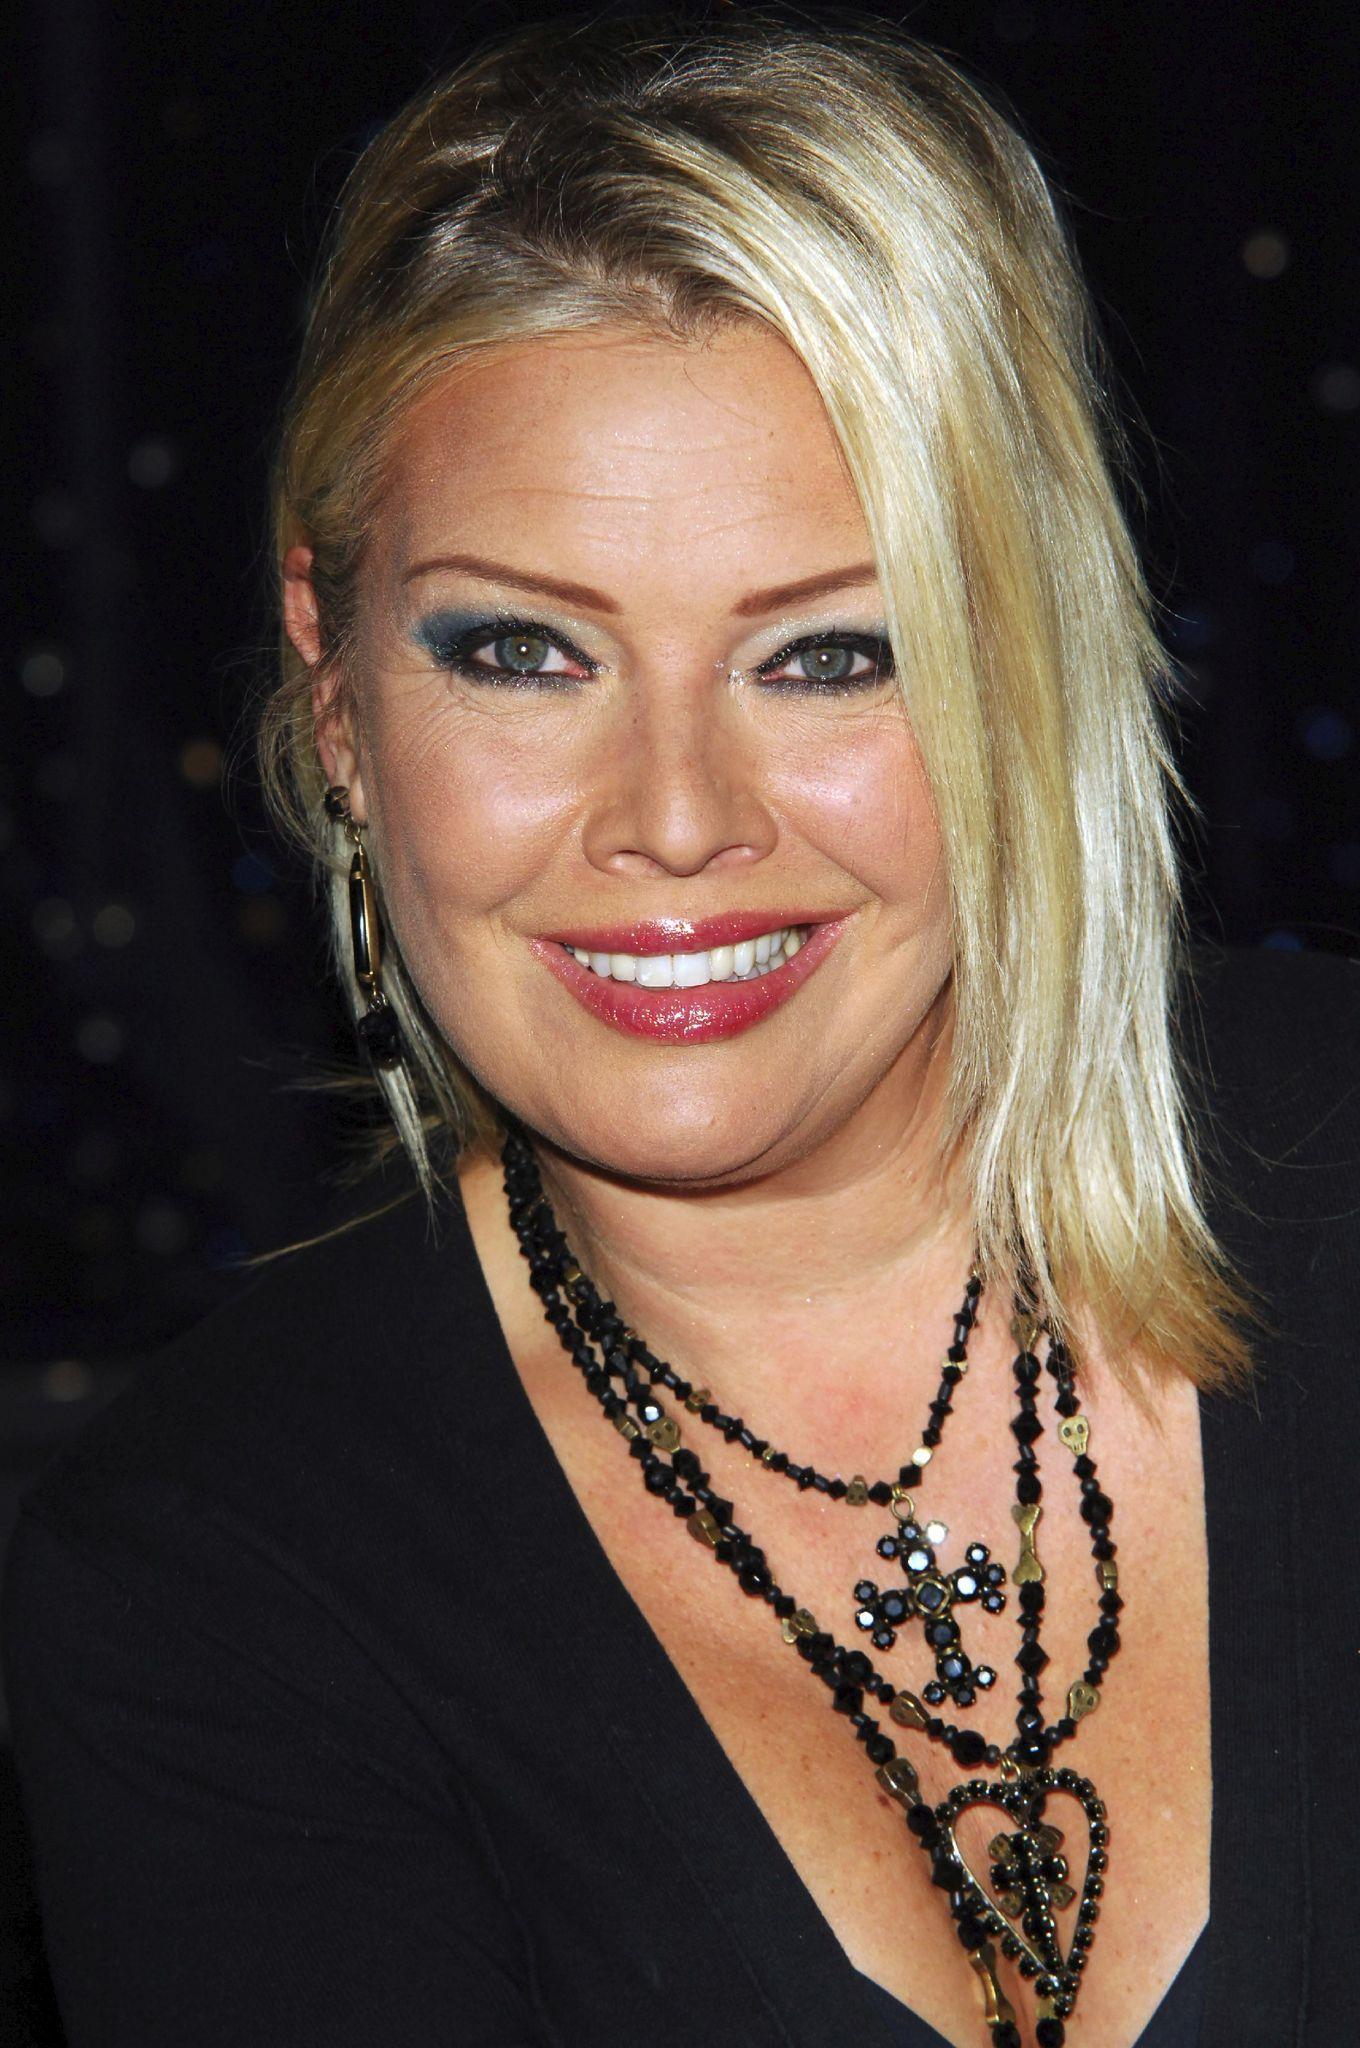 Kim Wilde Celebrities Celebrities, Female singers, Get